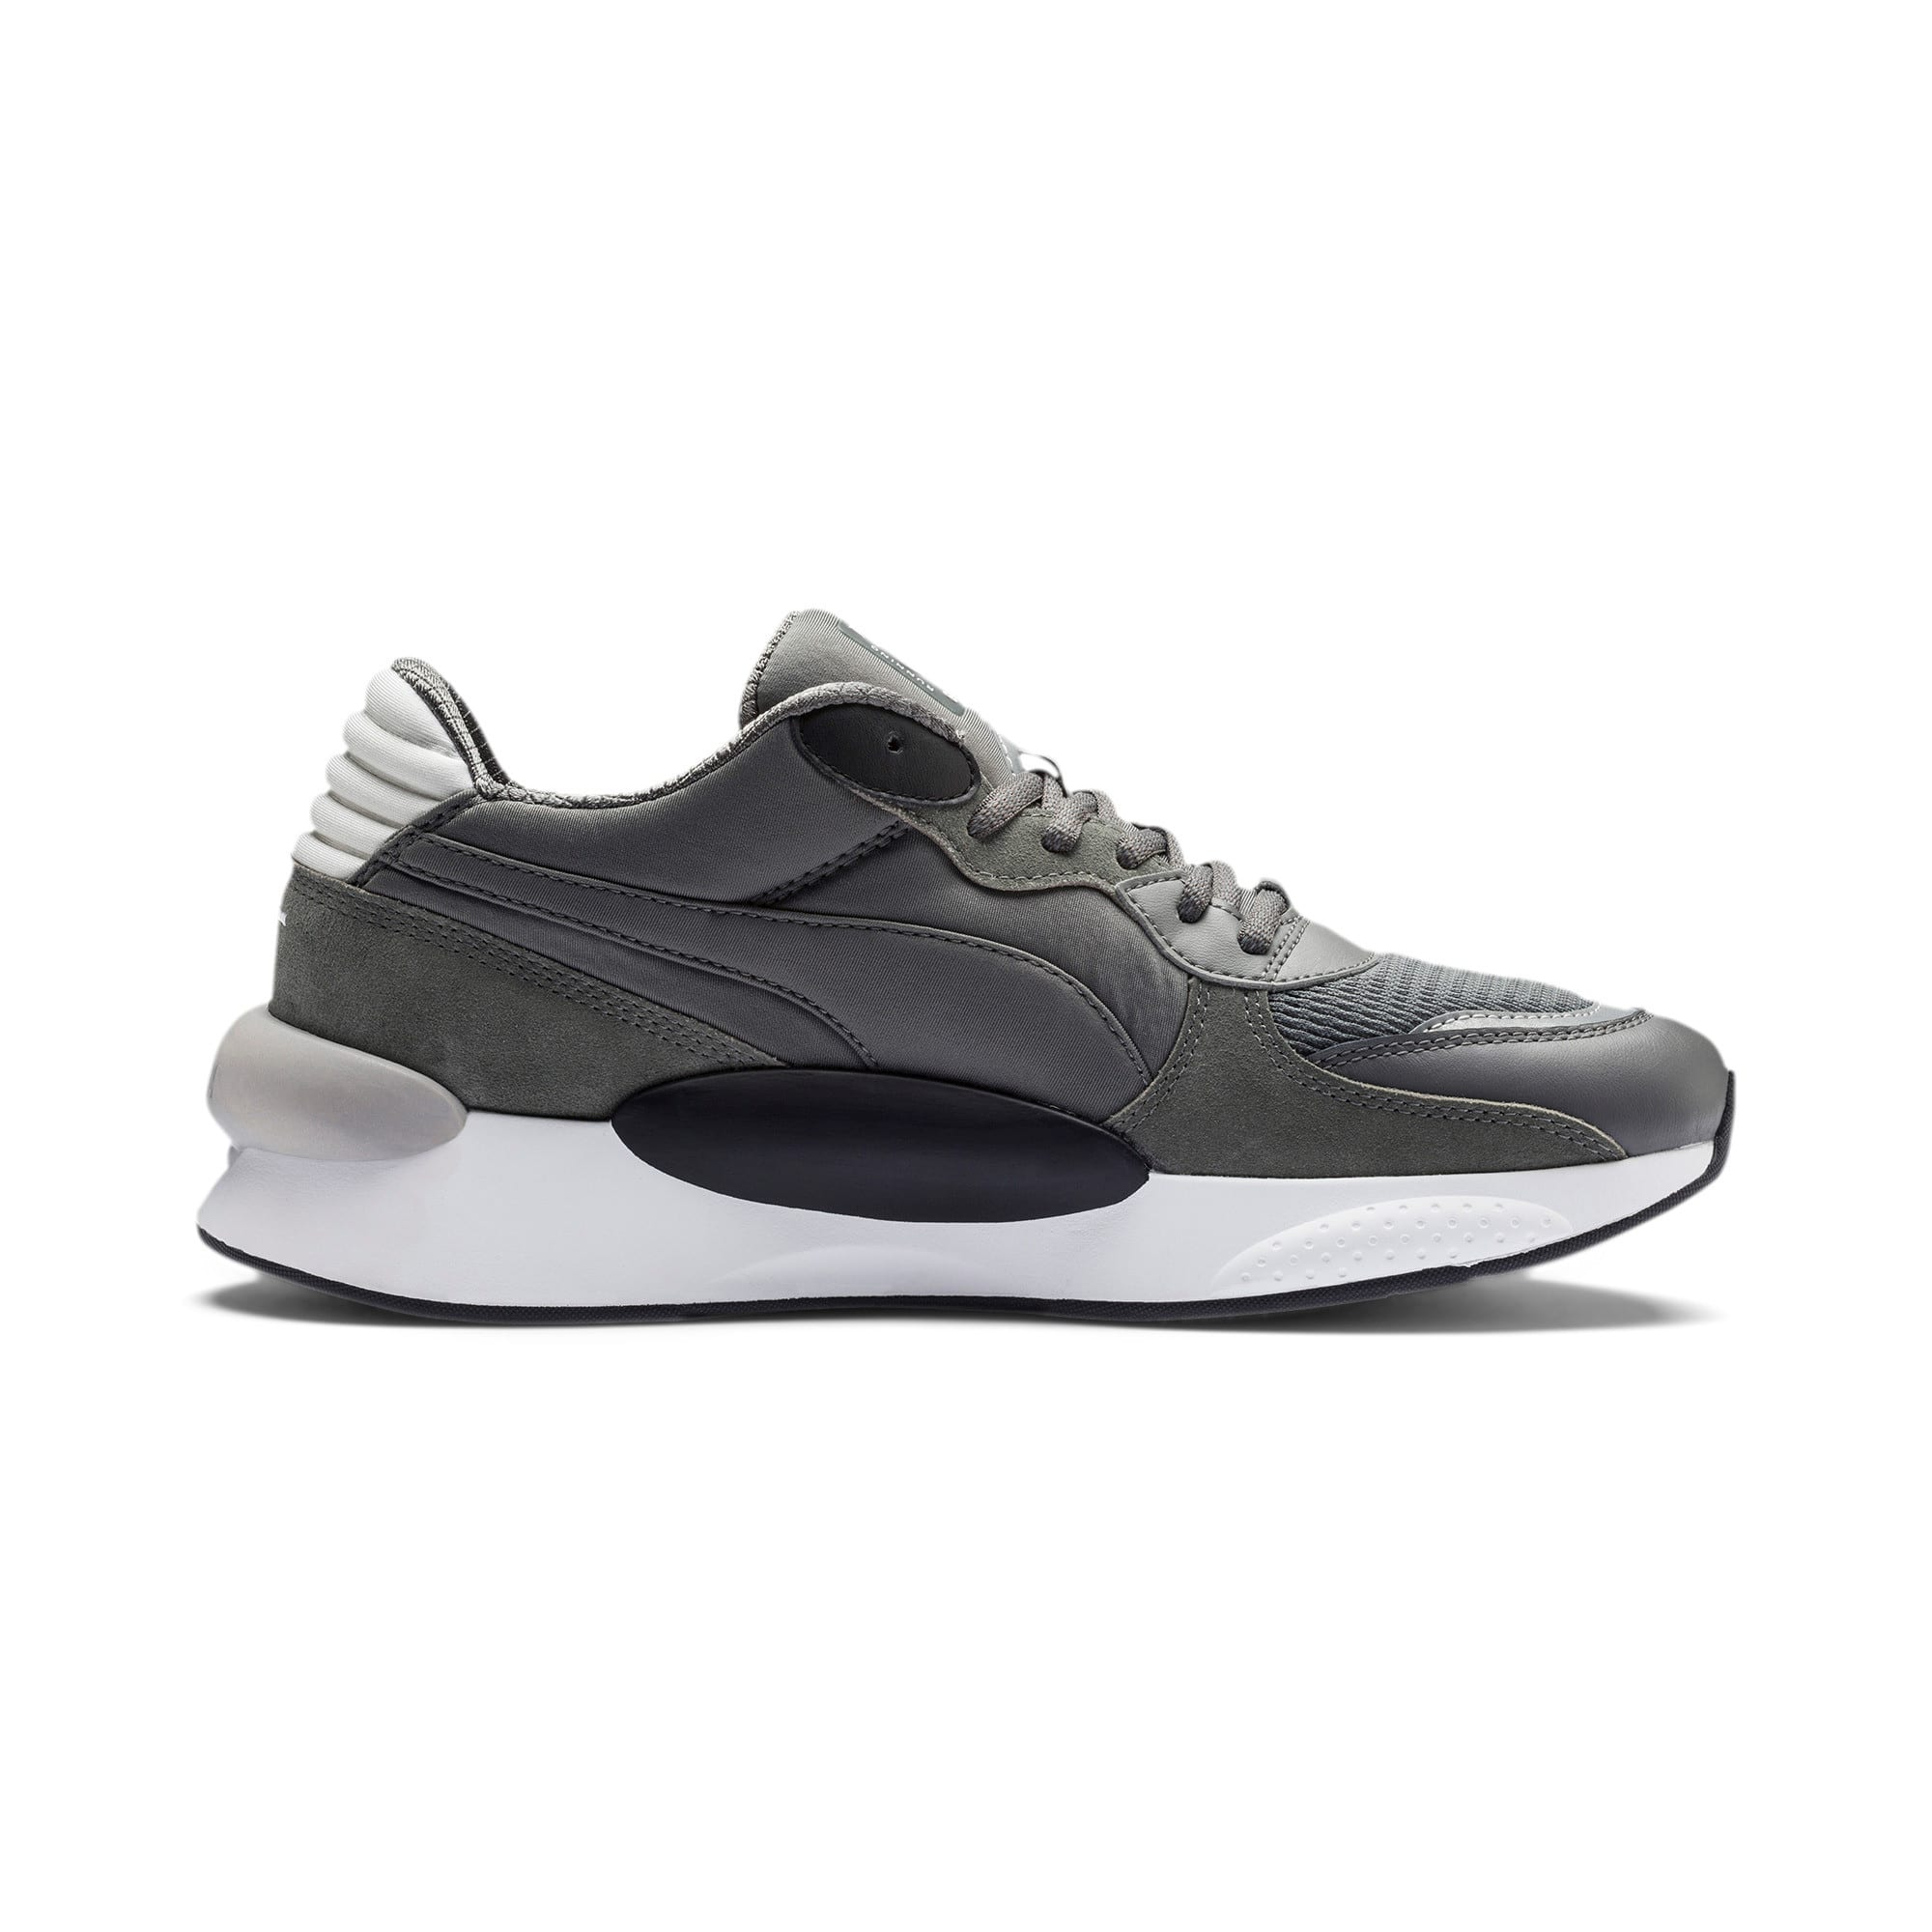 Thumbnail 5 of RS 9.8 Gravity Sneakers, CASTLEROCK-Puma Black, medium